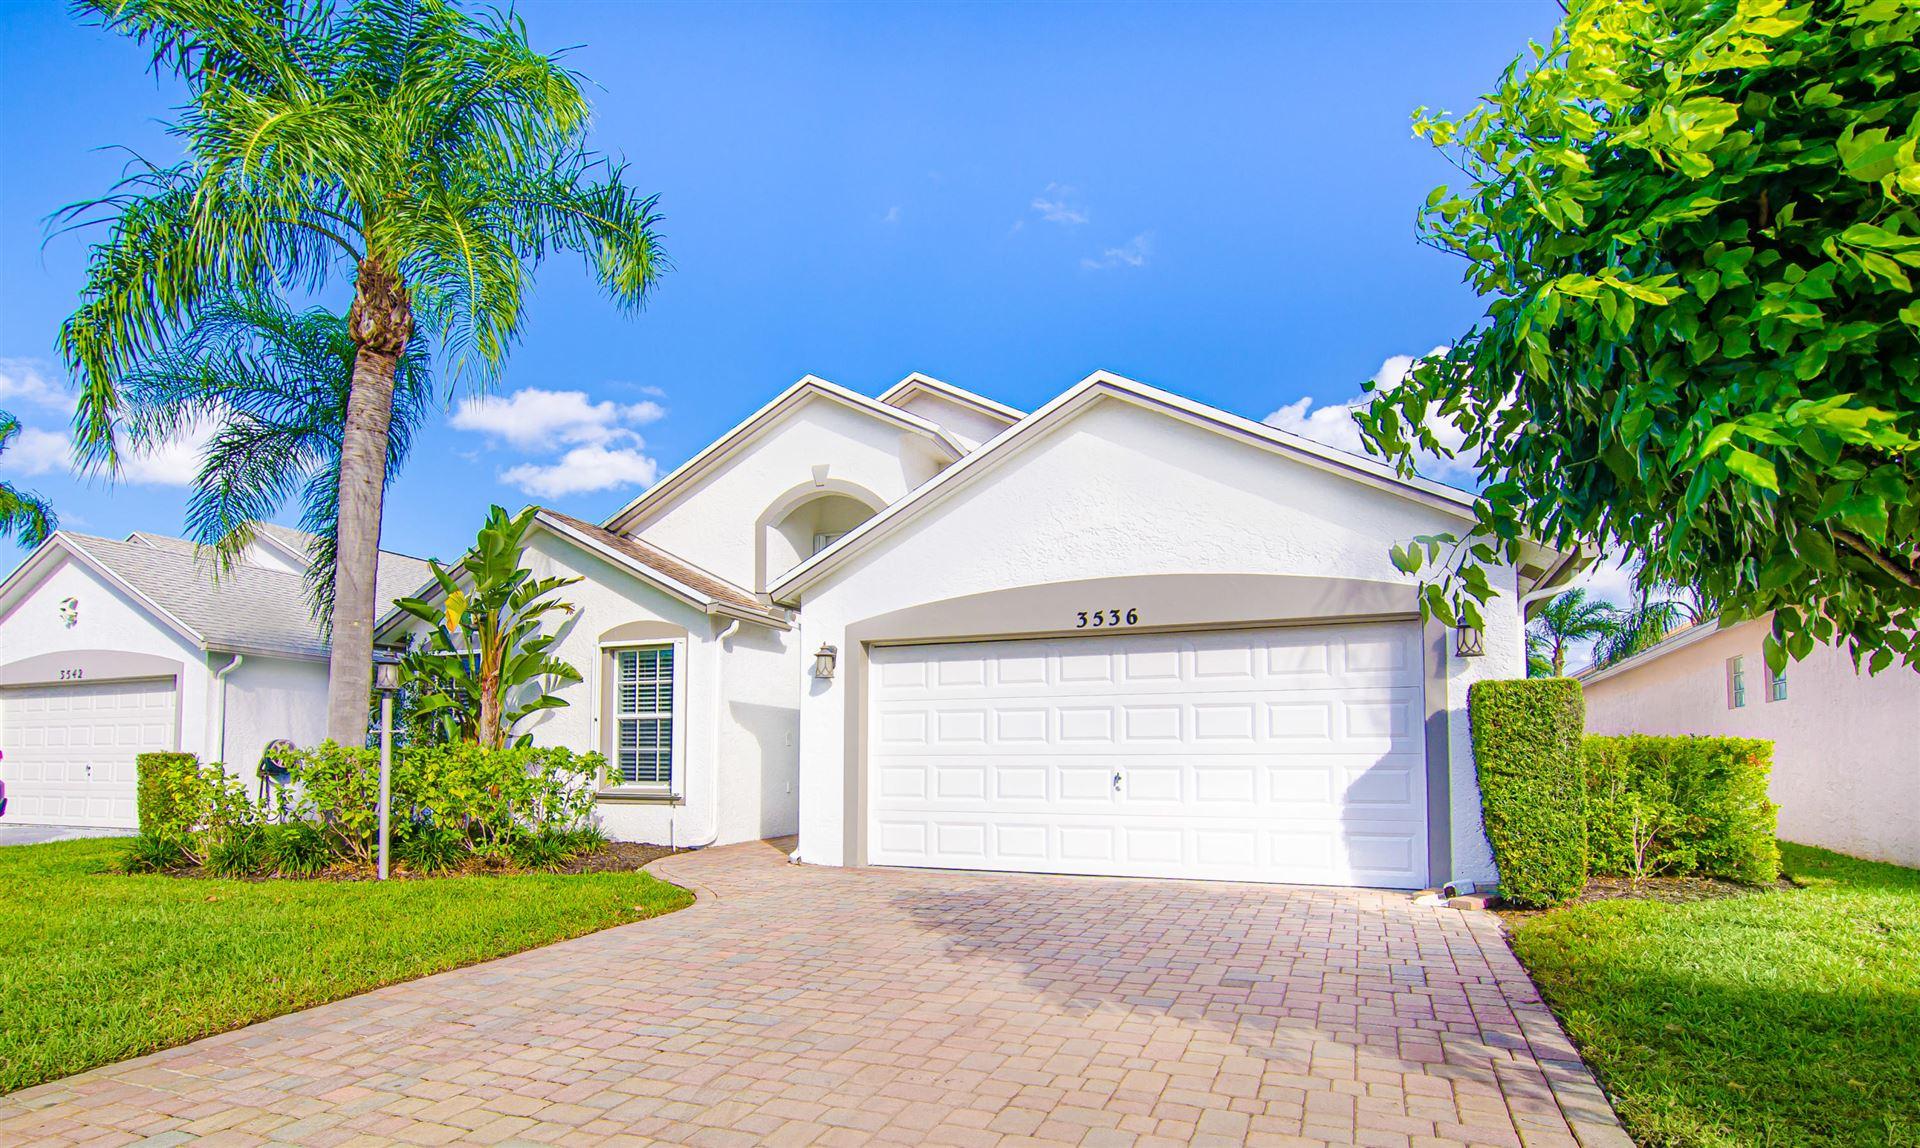 3536 Dora Lane, West Palm Beach, FL 33417 - #: RX-10668219